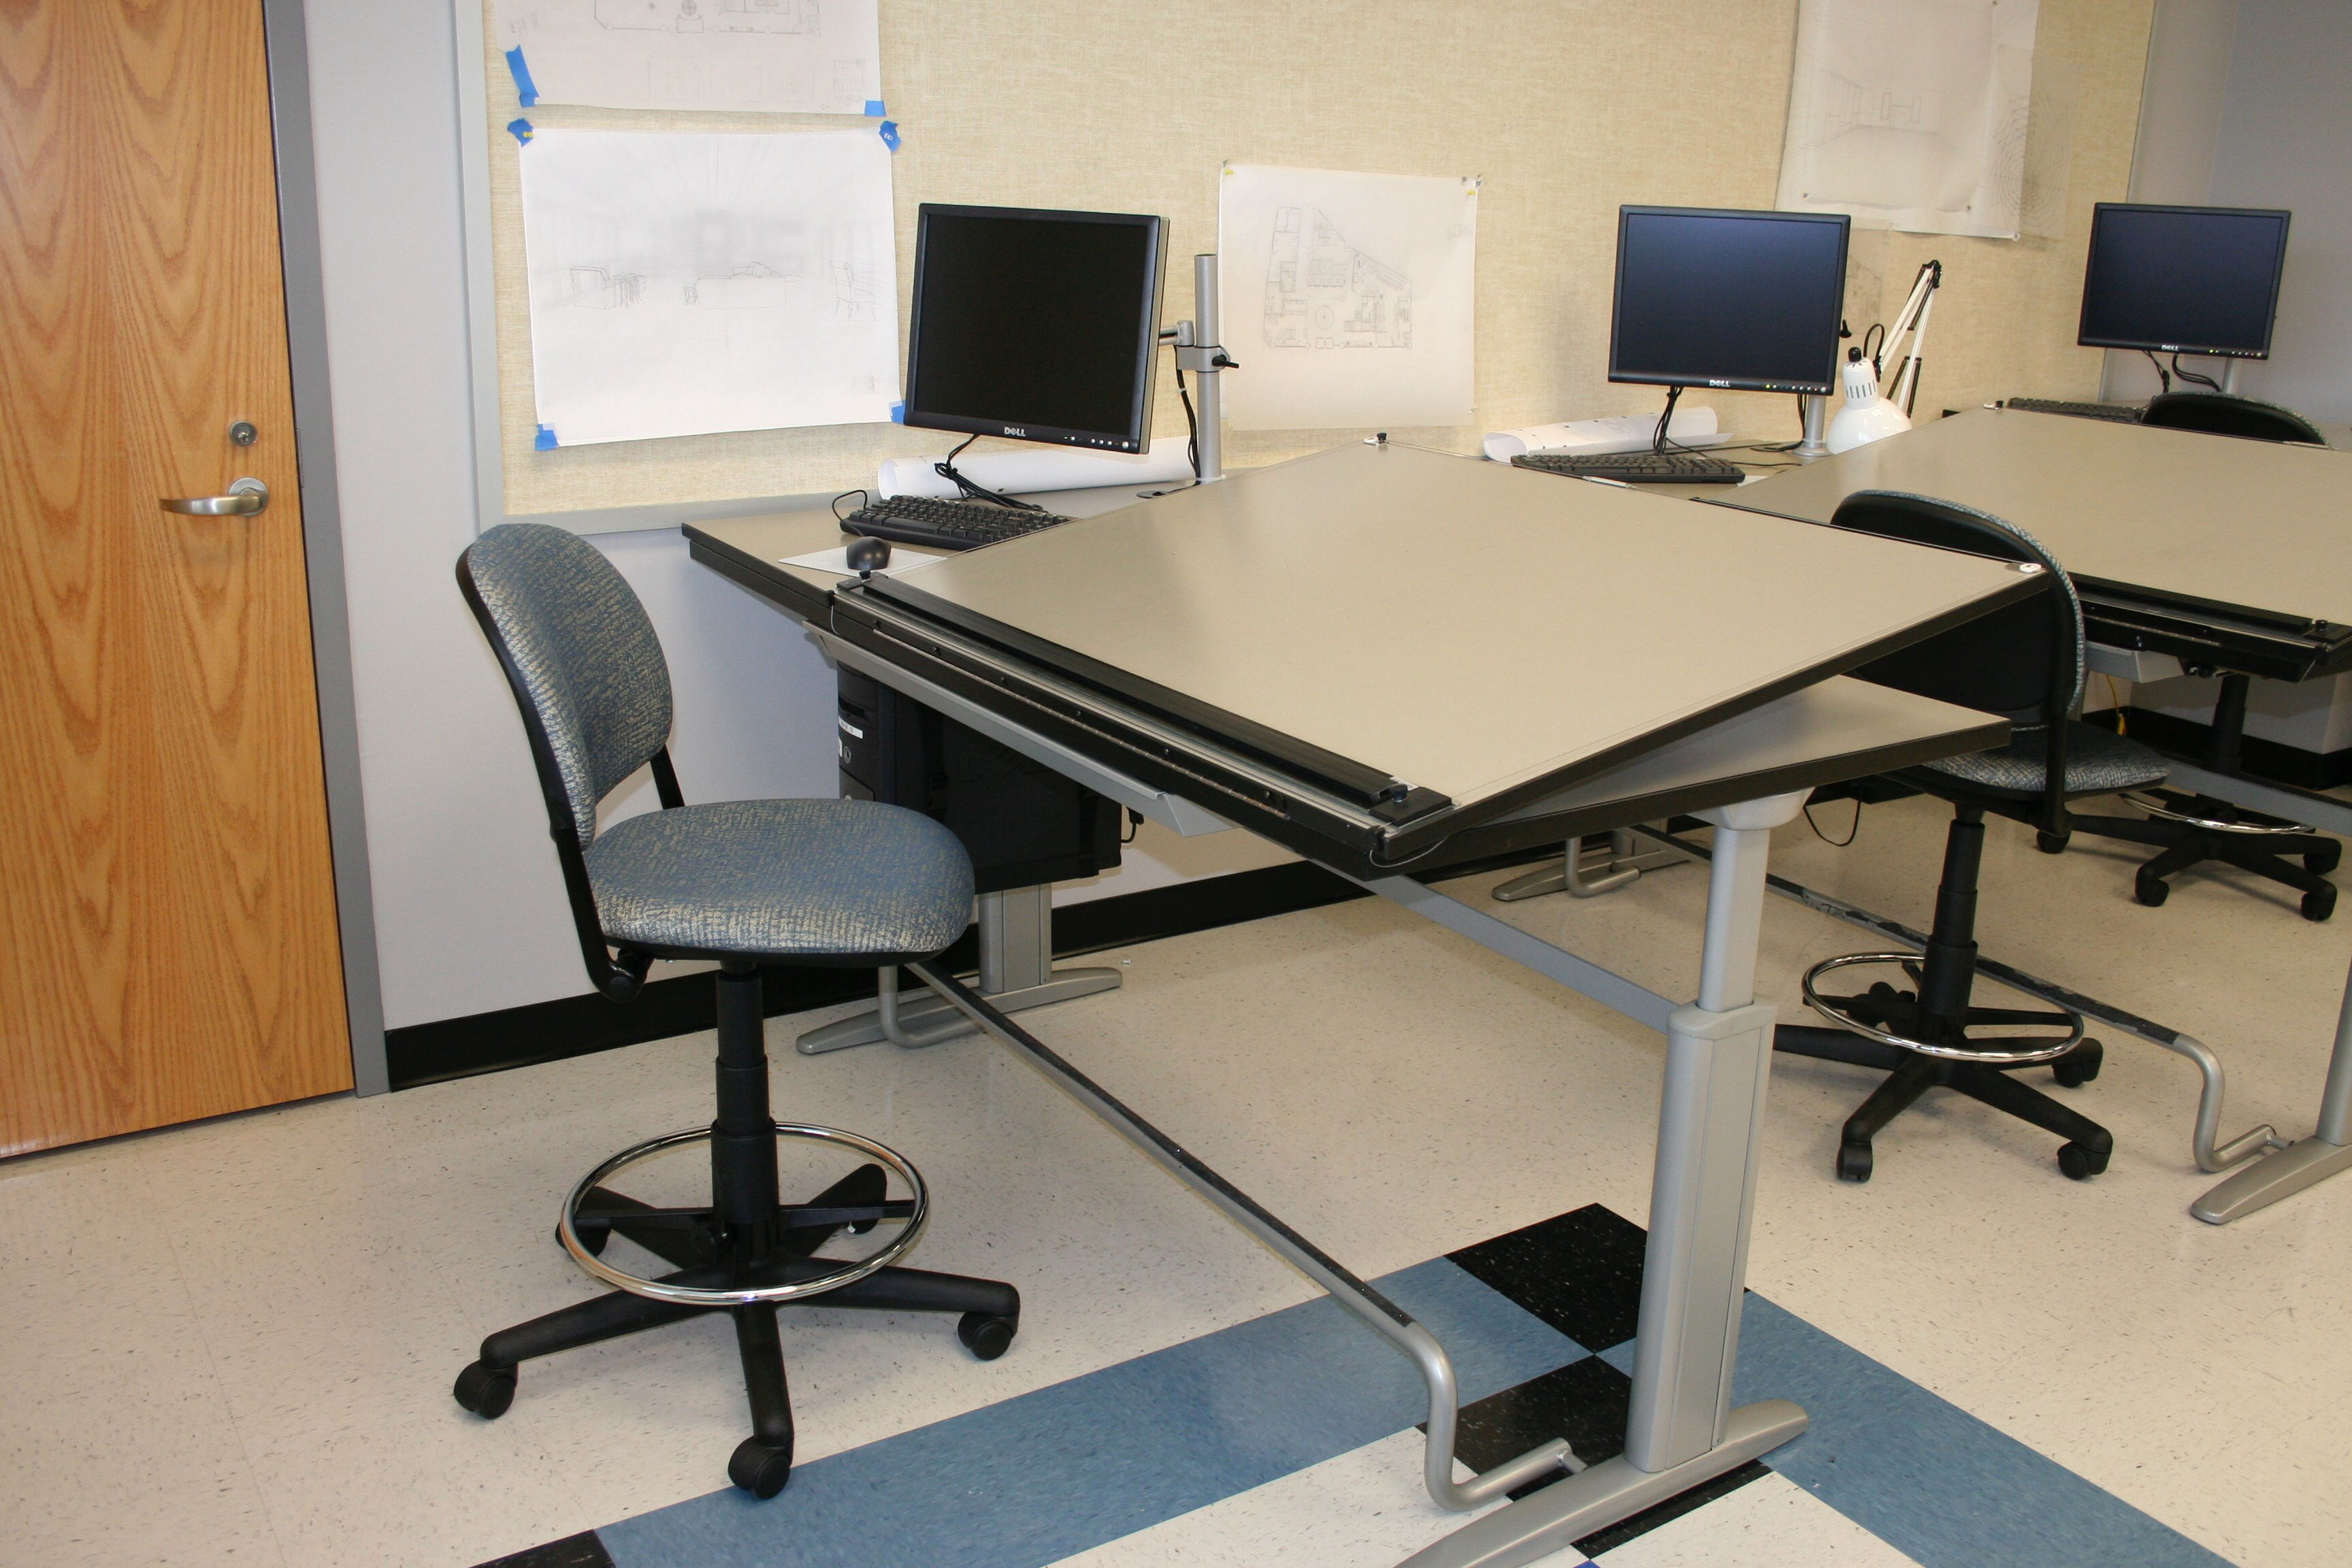 Nice KI Drafting Table, Adjustable Height.